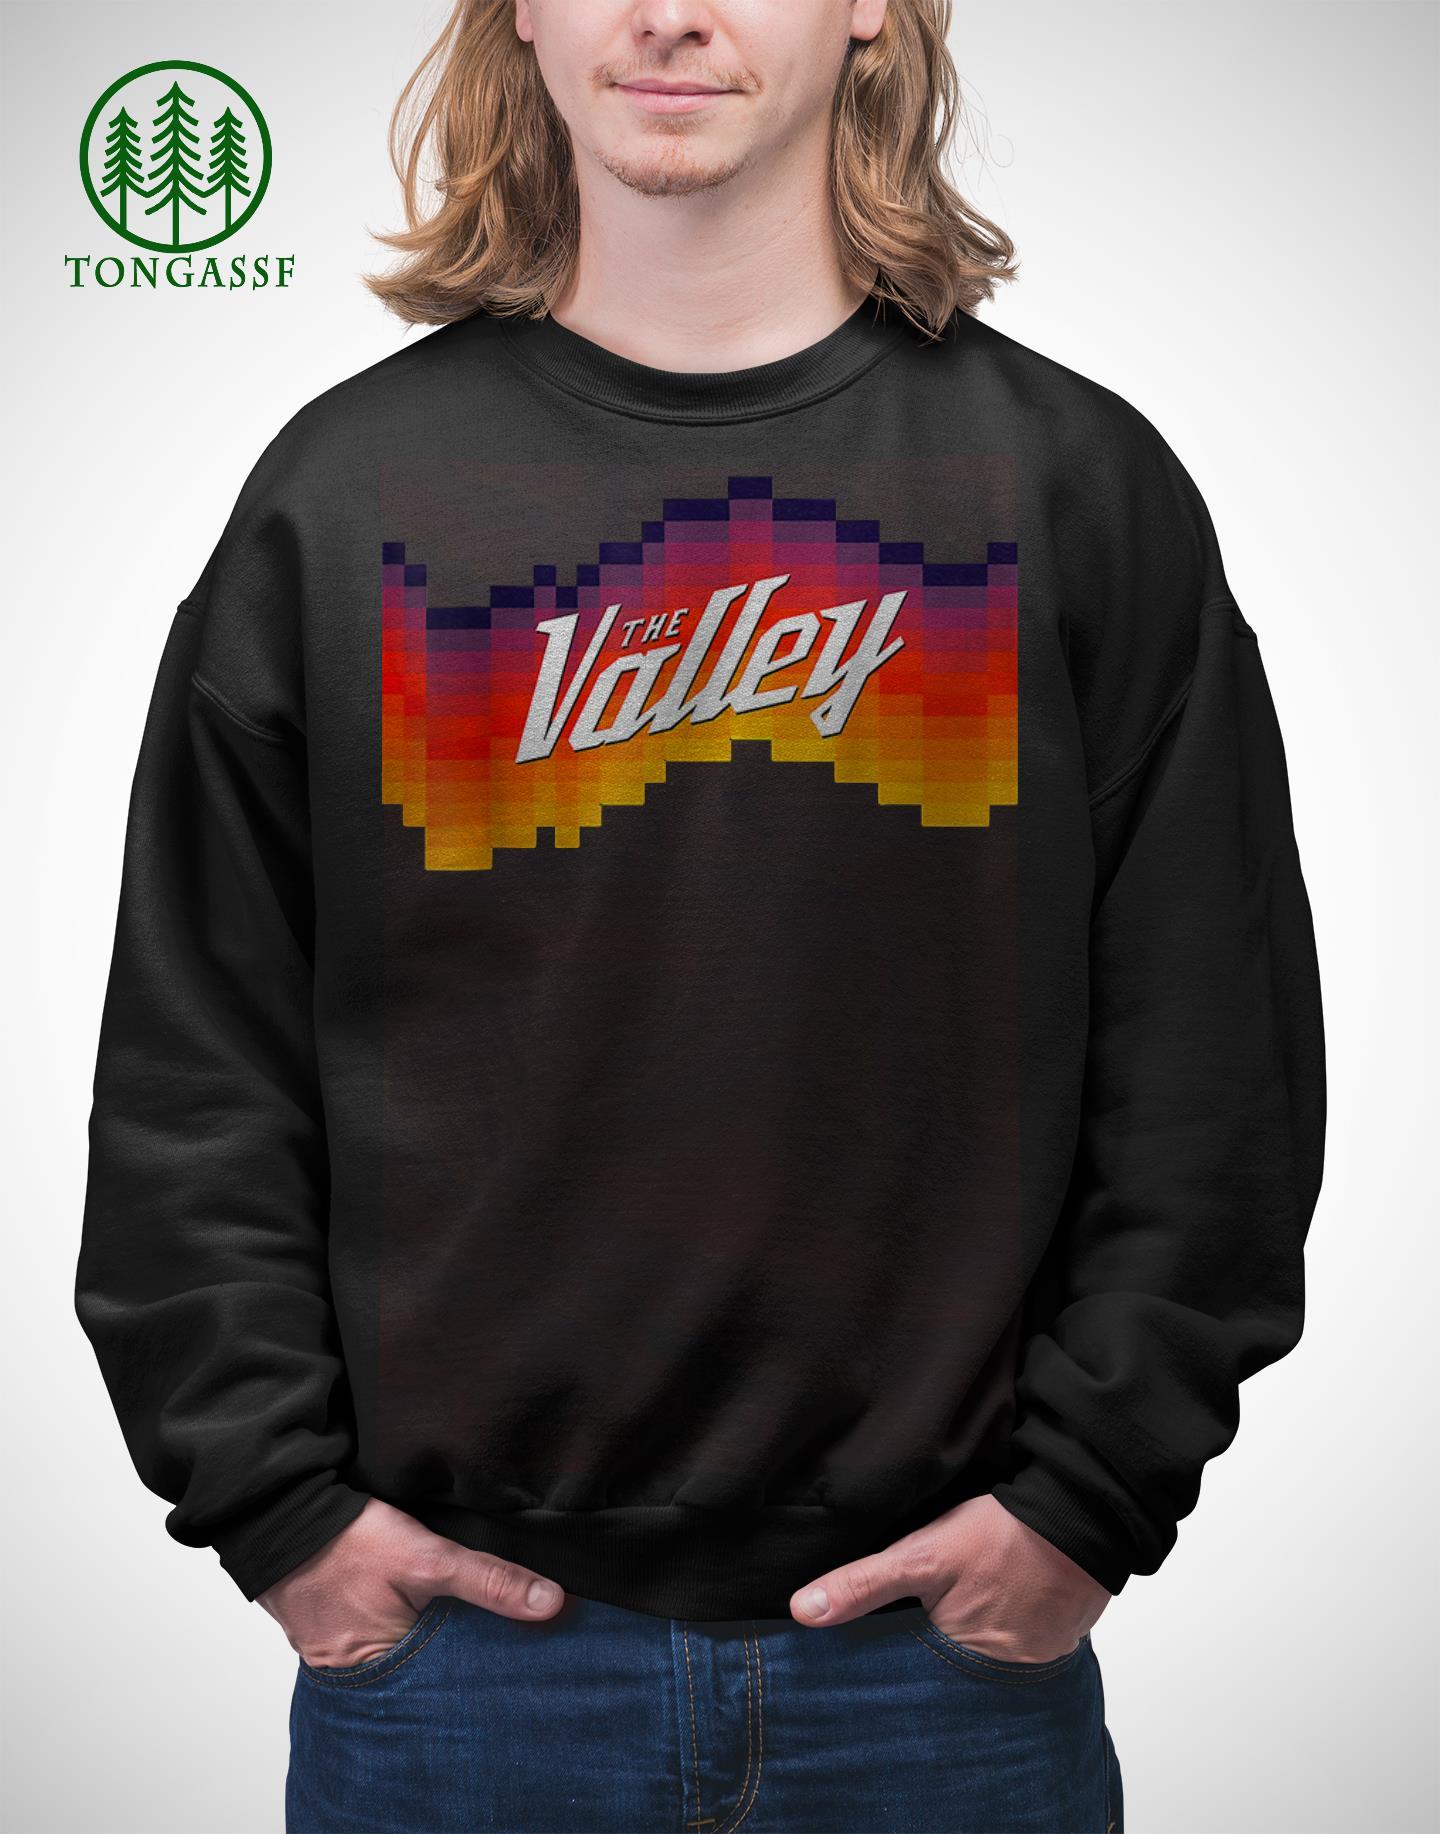 Phoenix Suns The Valley City Jersey Baseball Shirt